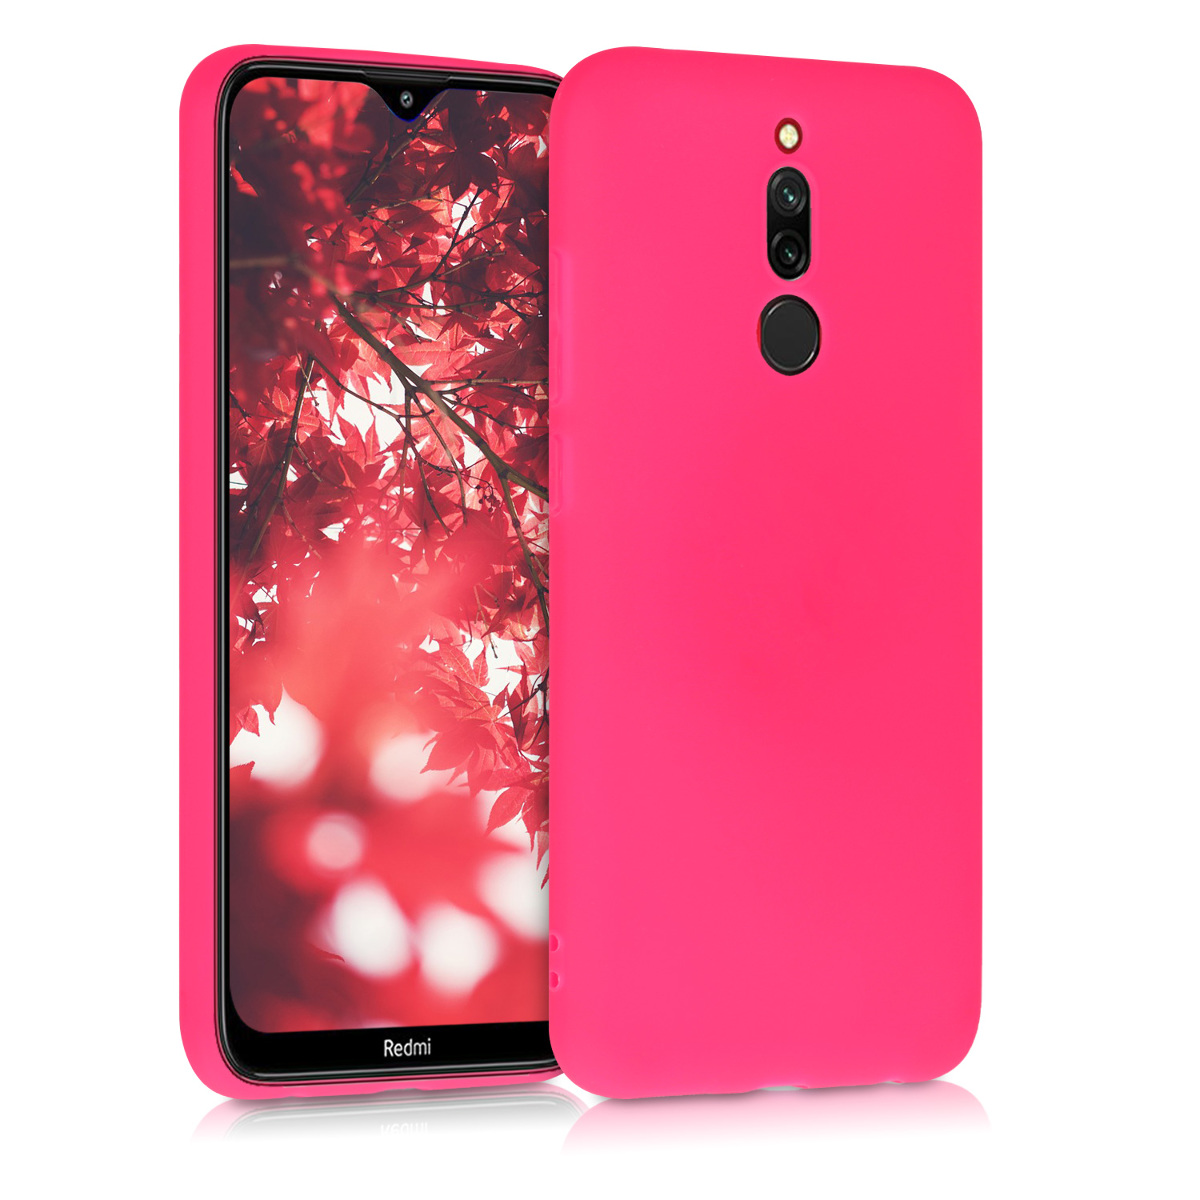 Kvalitní silikonové TPU pouzdro | obal pro Xiaomi Redmi 8 - Neon růžový